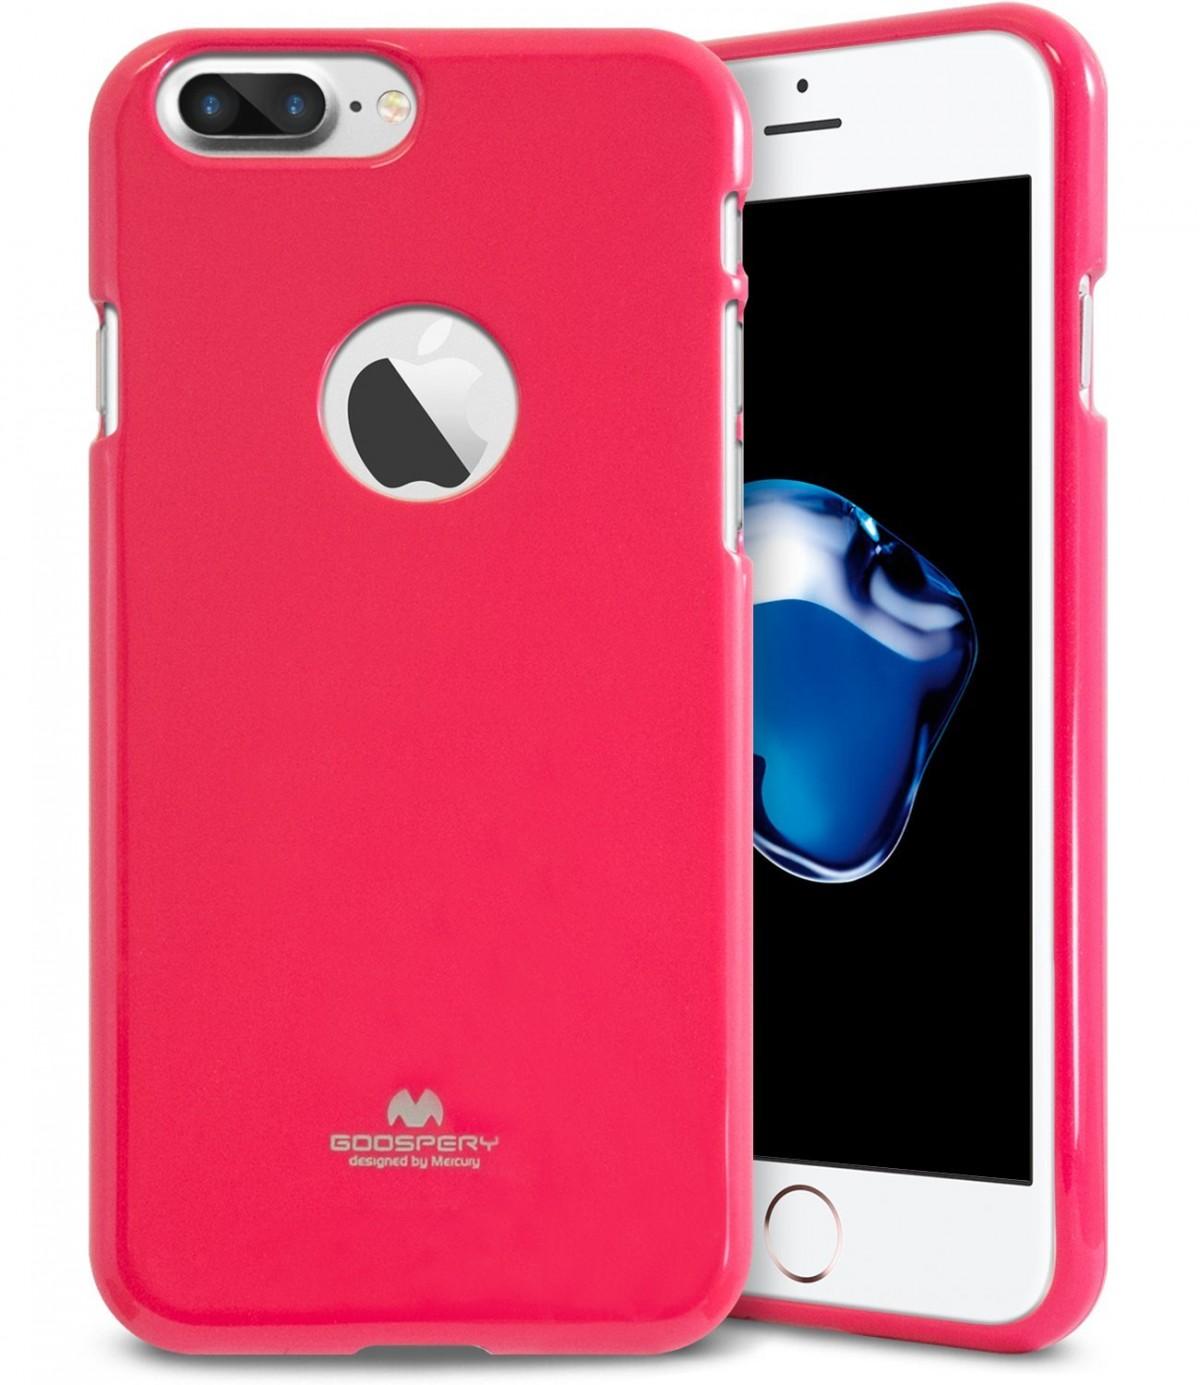 Pouzdro Goospery Mercury Jelly Case Apple iPhone 8 Plus / 7 Plus - Tmavě růžové / Hot růžové